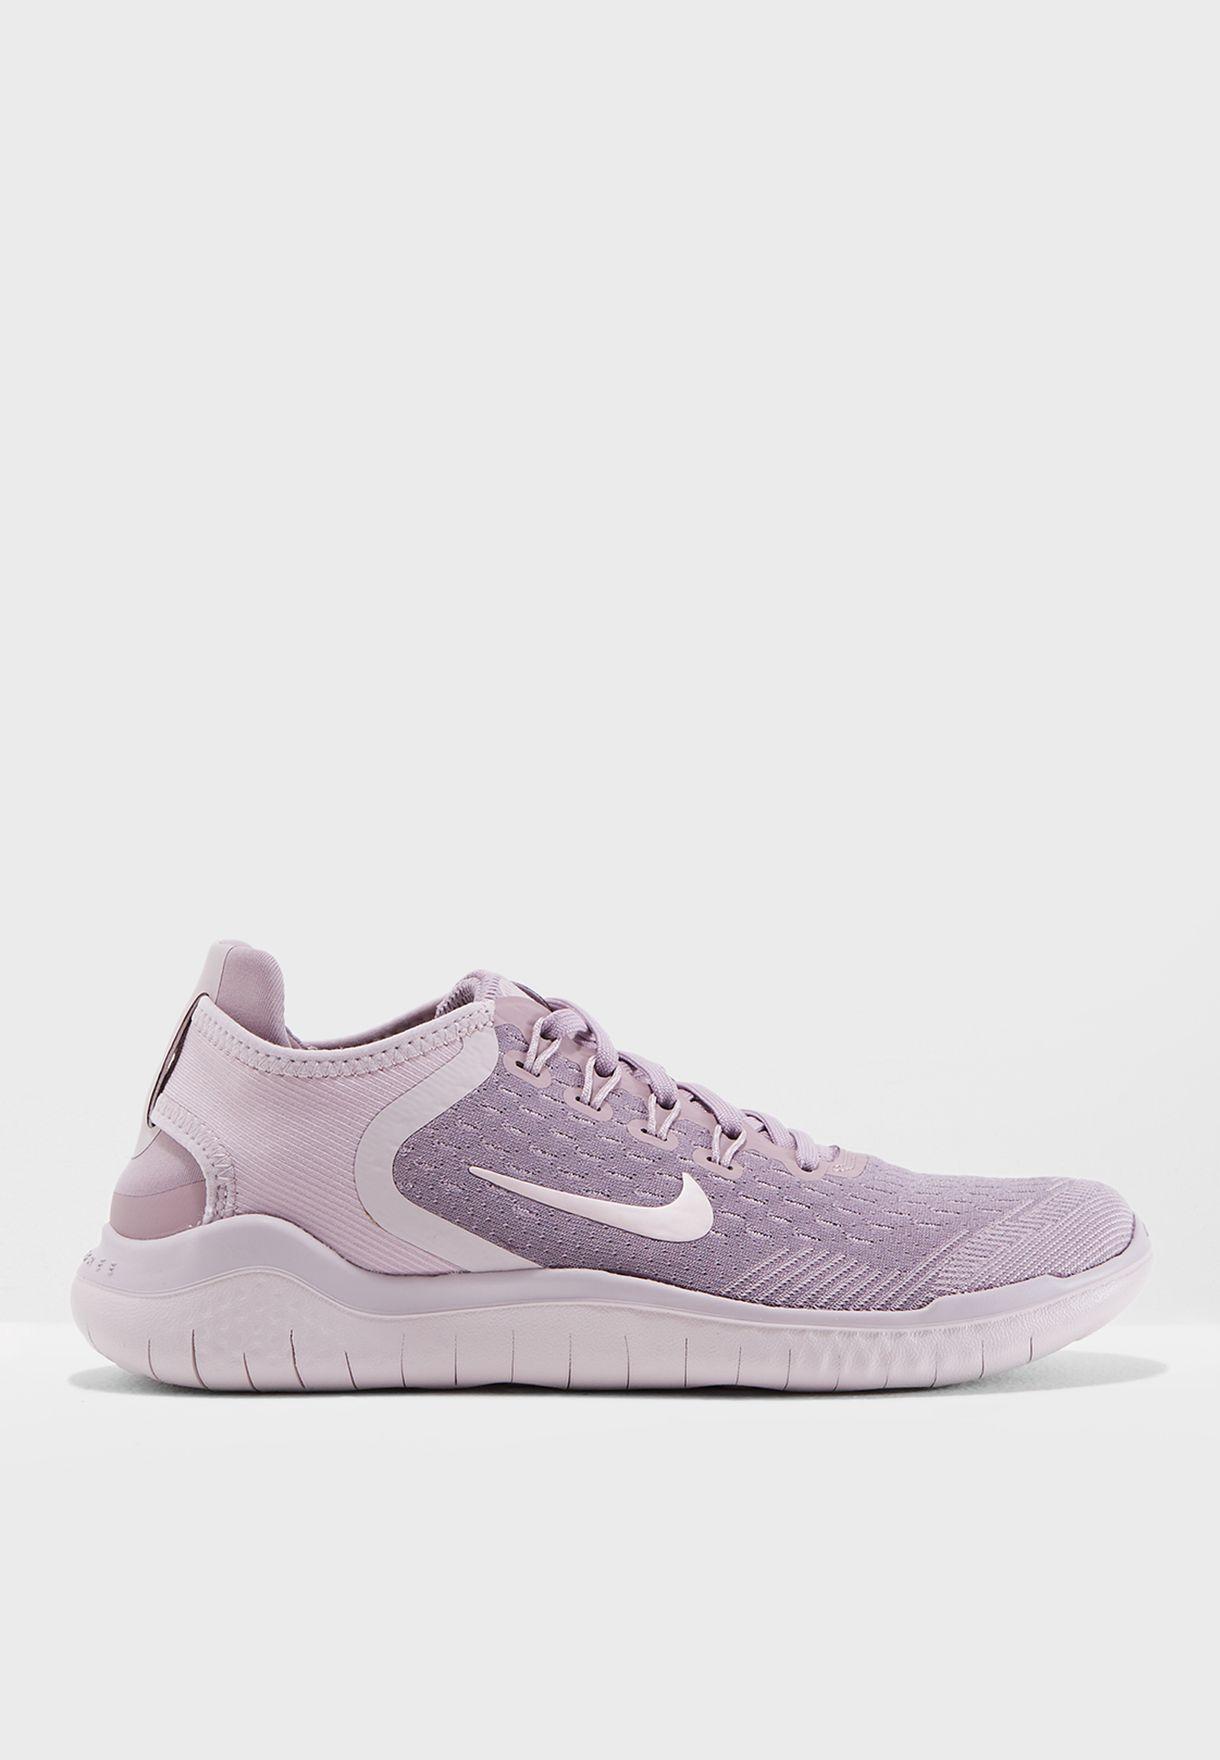 cd7a8befe7d5e Shop Nike purple Free RN 2018 942837-600 for Women in Saudi ...